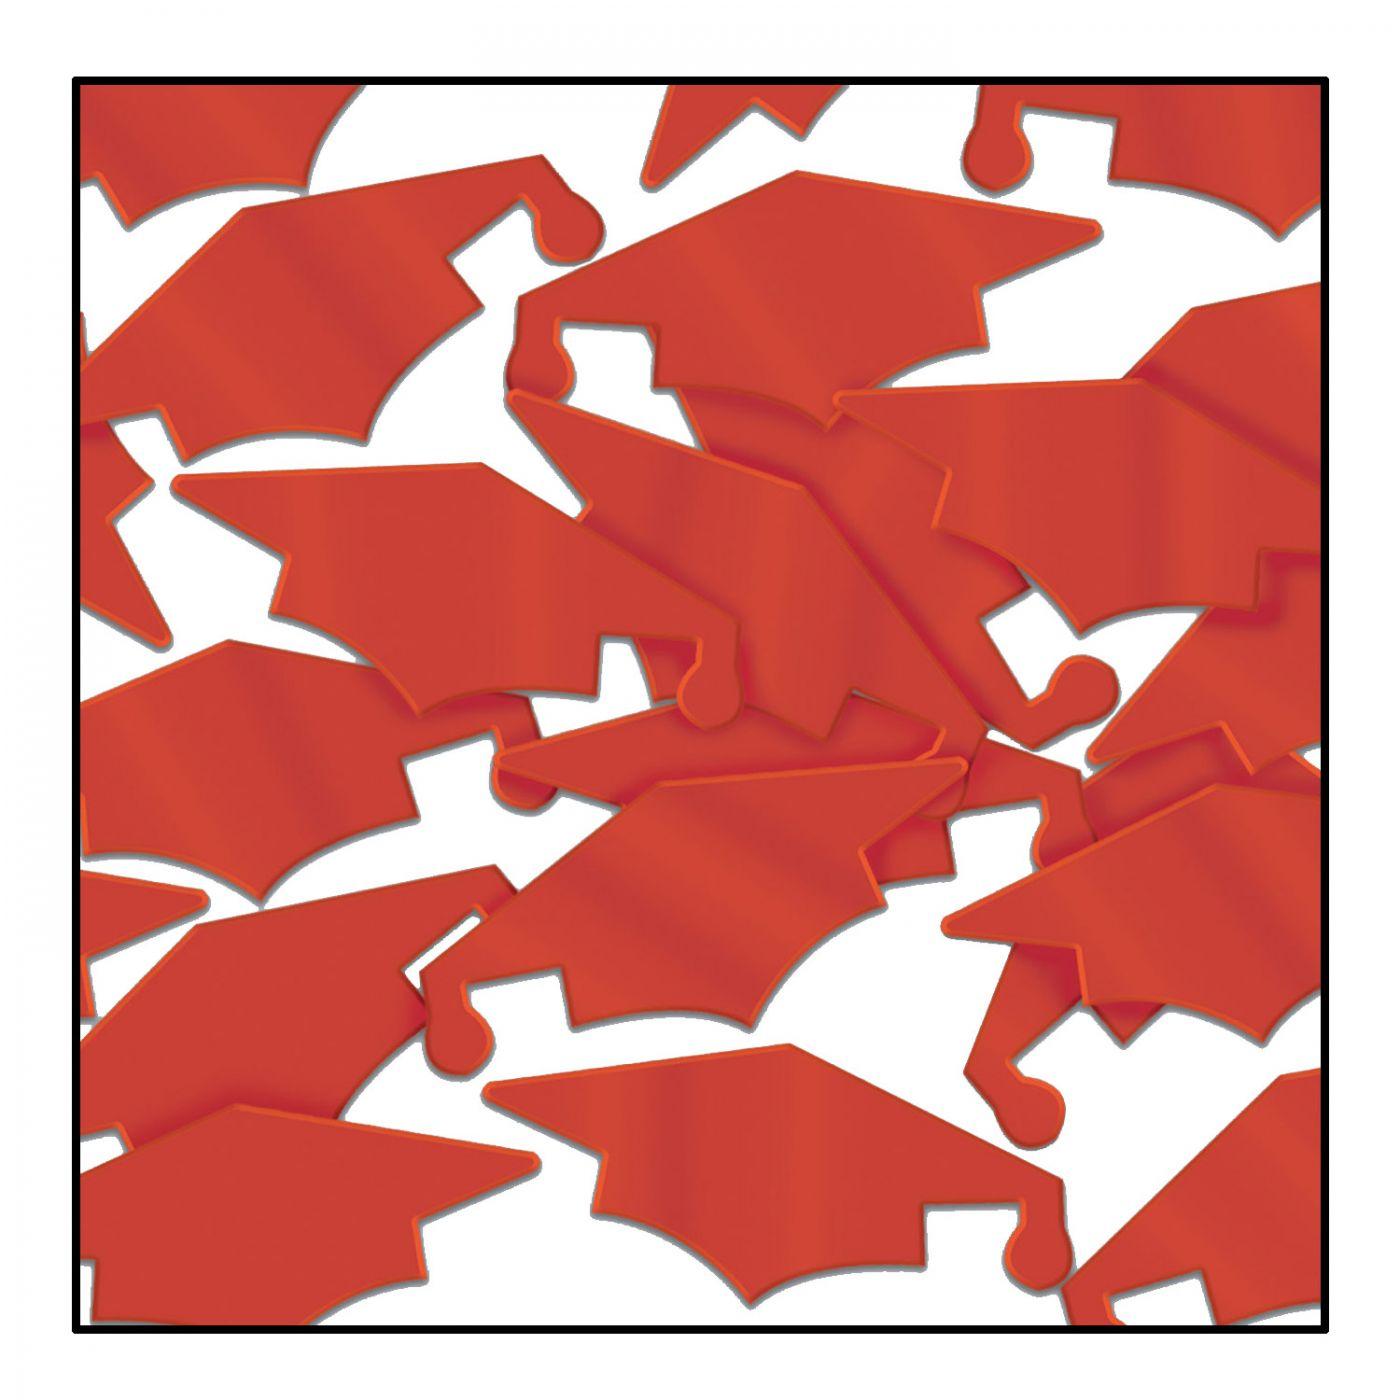 Fanci-Fetti Graduate Caps image